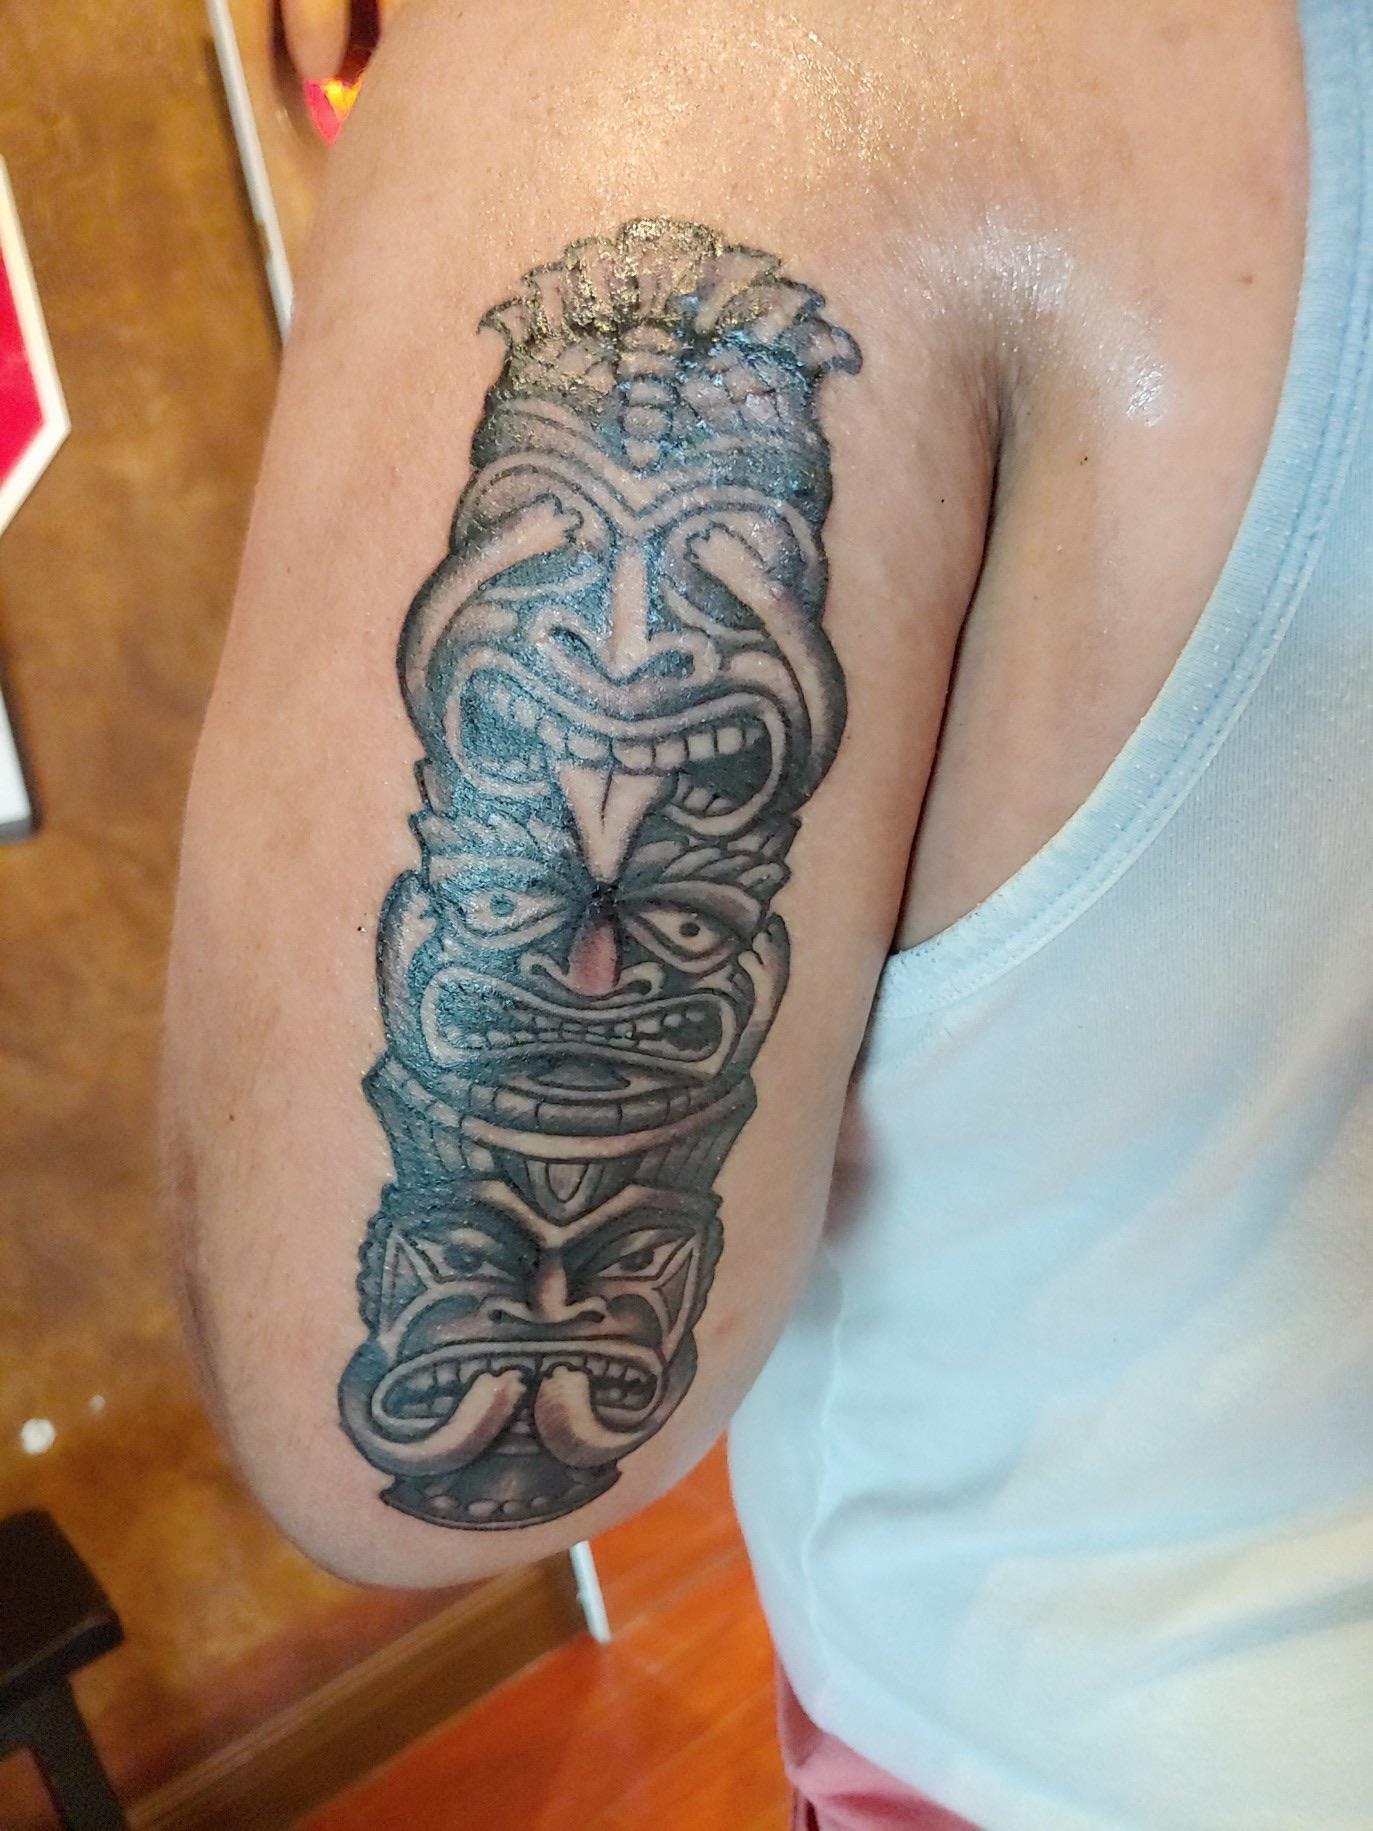 No Evil Tattoo : tattoo, Evil,, Speak, Evil., Babin, Subcultures, Orange, City,, Tattoos